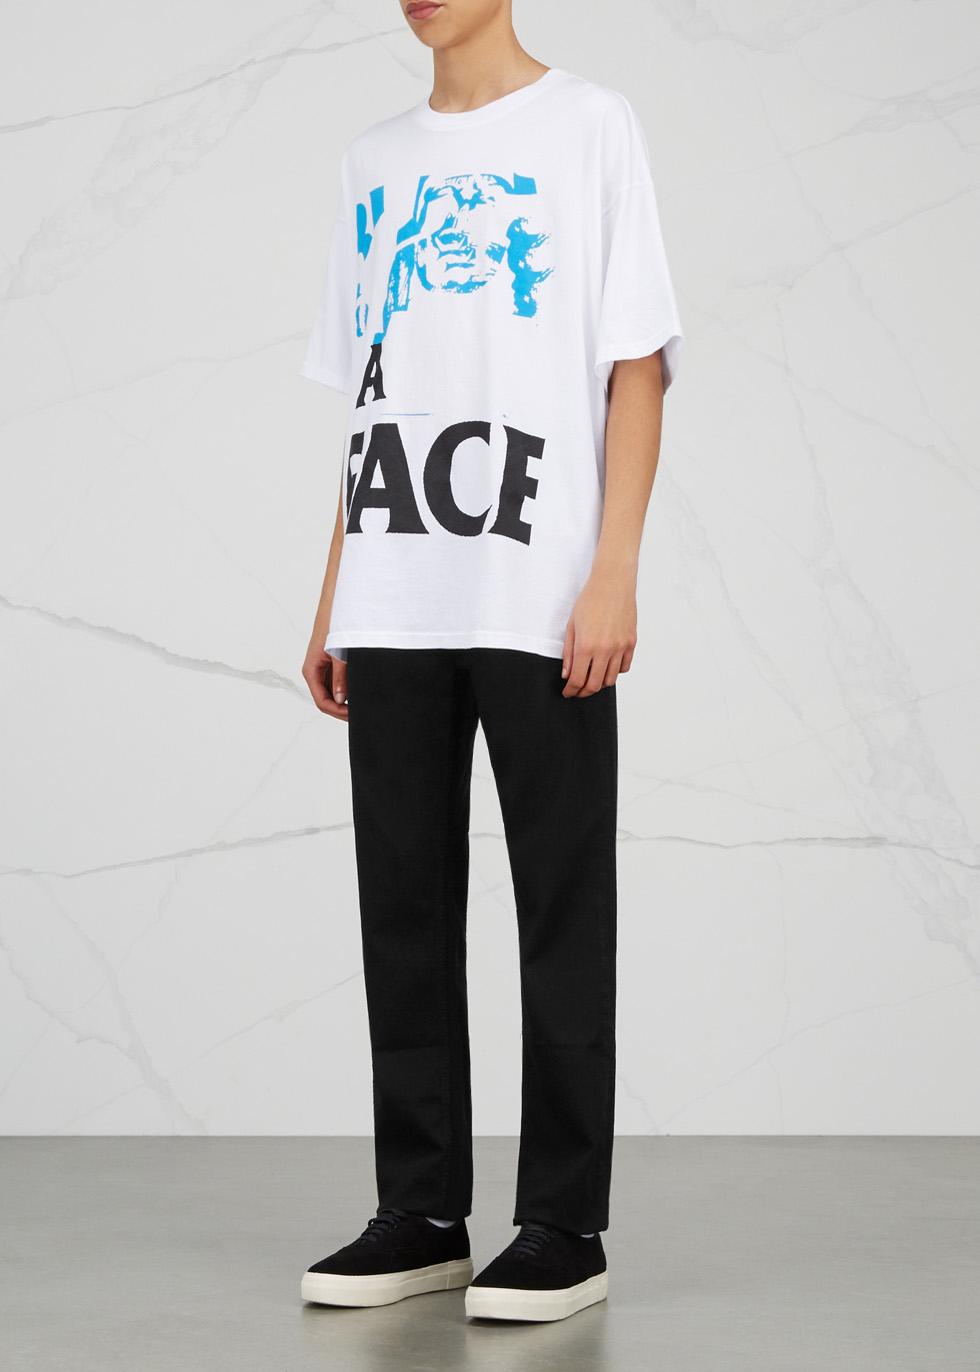 Federal Transcend straight-leg jeans - Paige